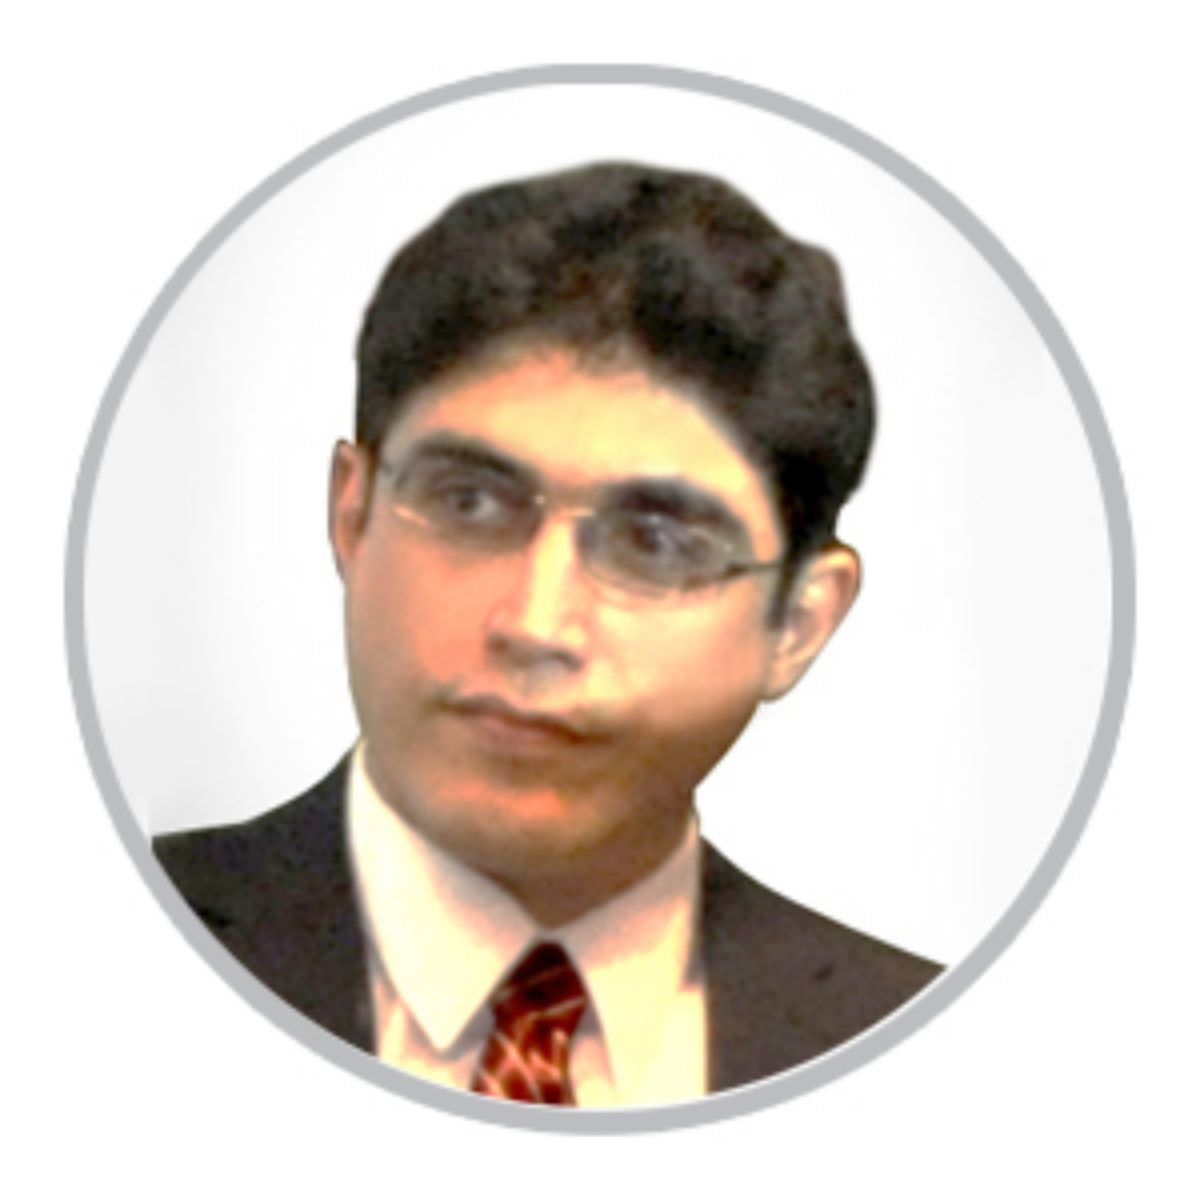 Dr. Alireza Haghighi